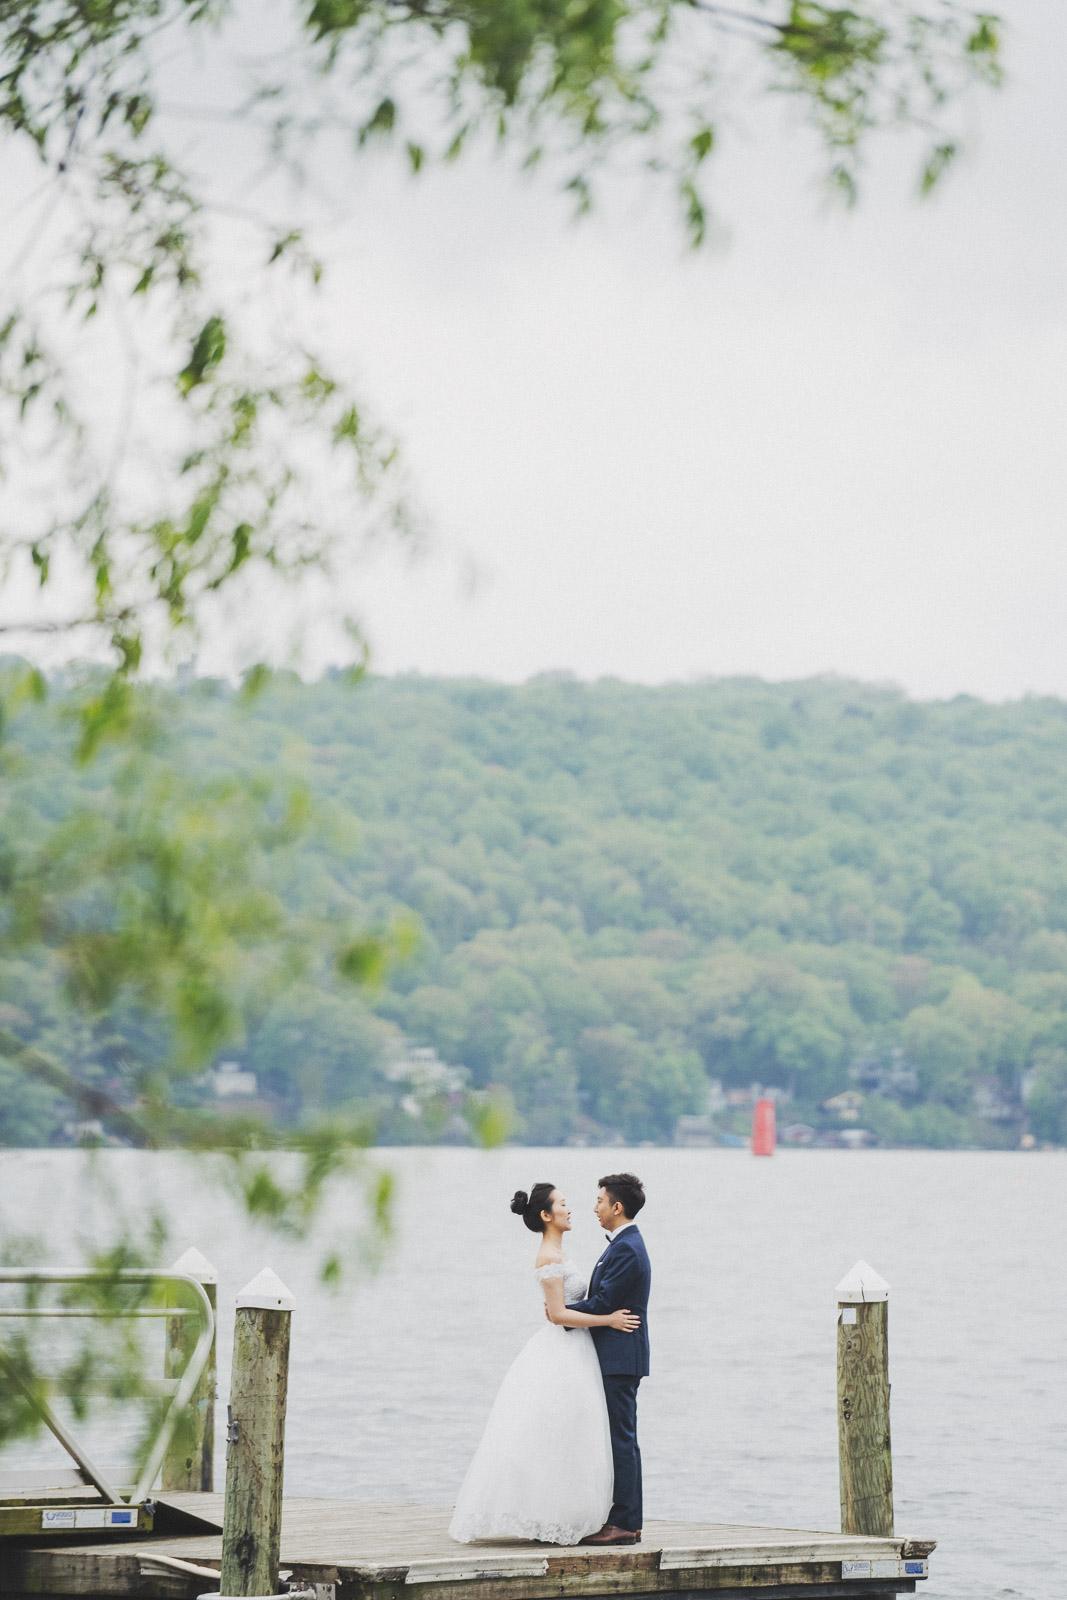 Ithaca海外婚紗拍攝_purefoto